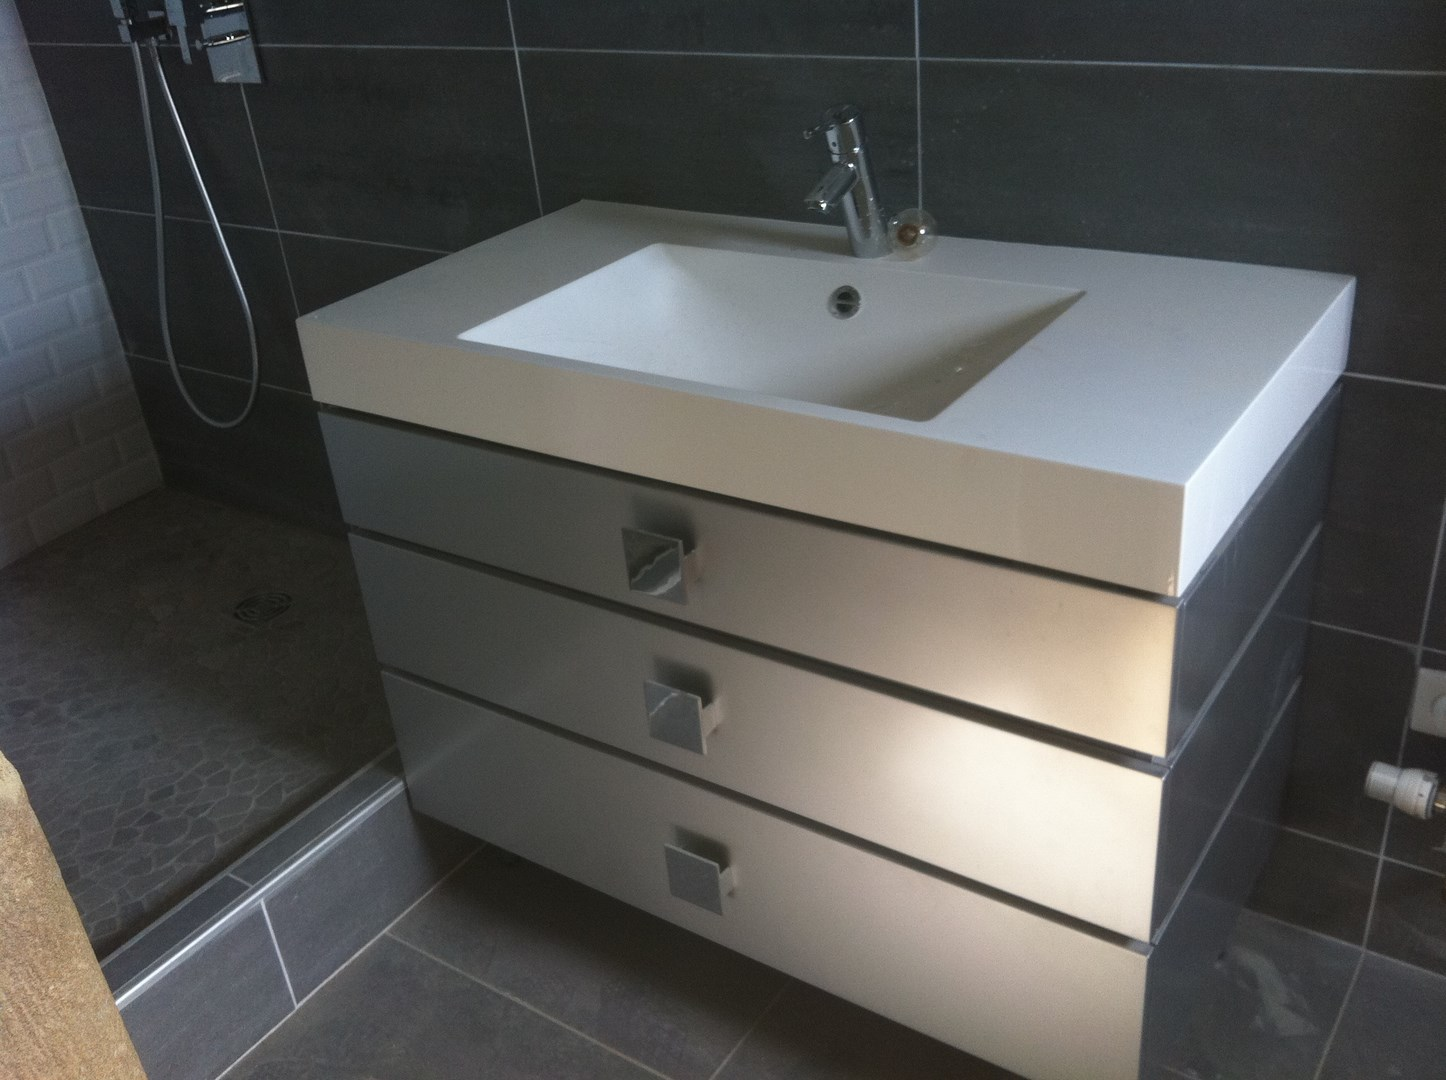 ADC CARRELAGE, rénovation salle de bain Jonage, rénovation salle ...